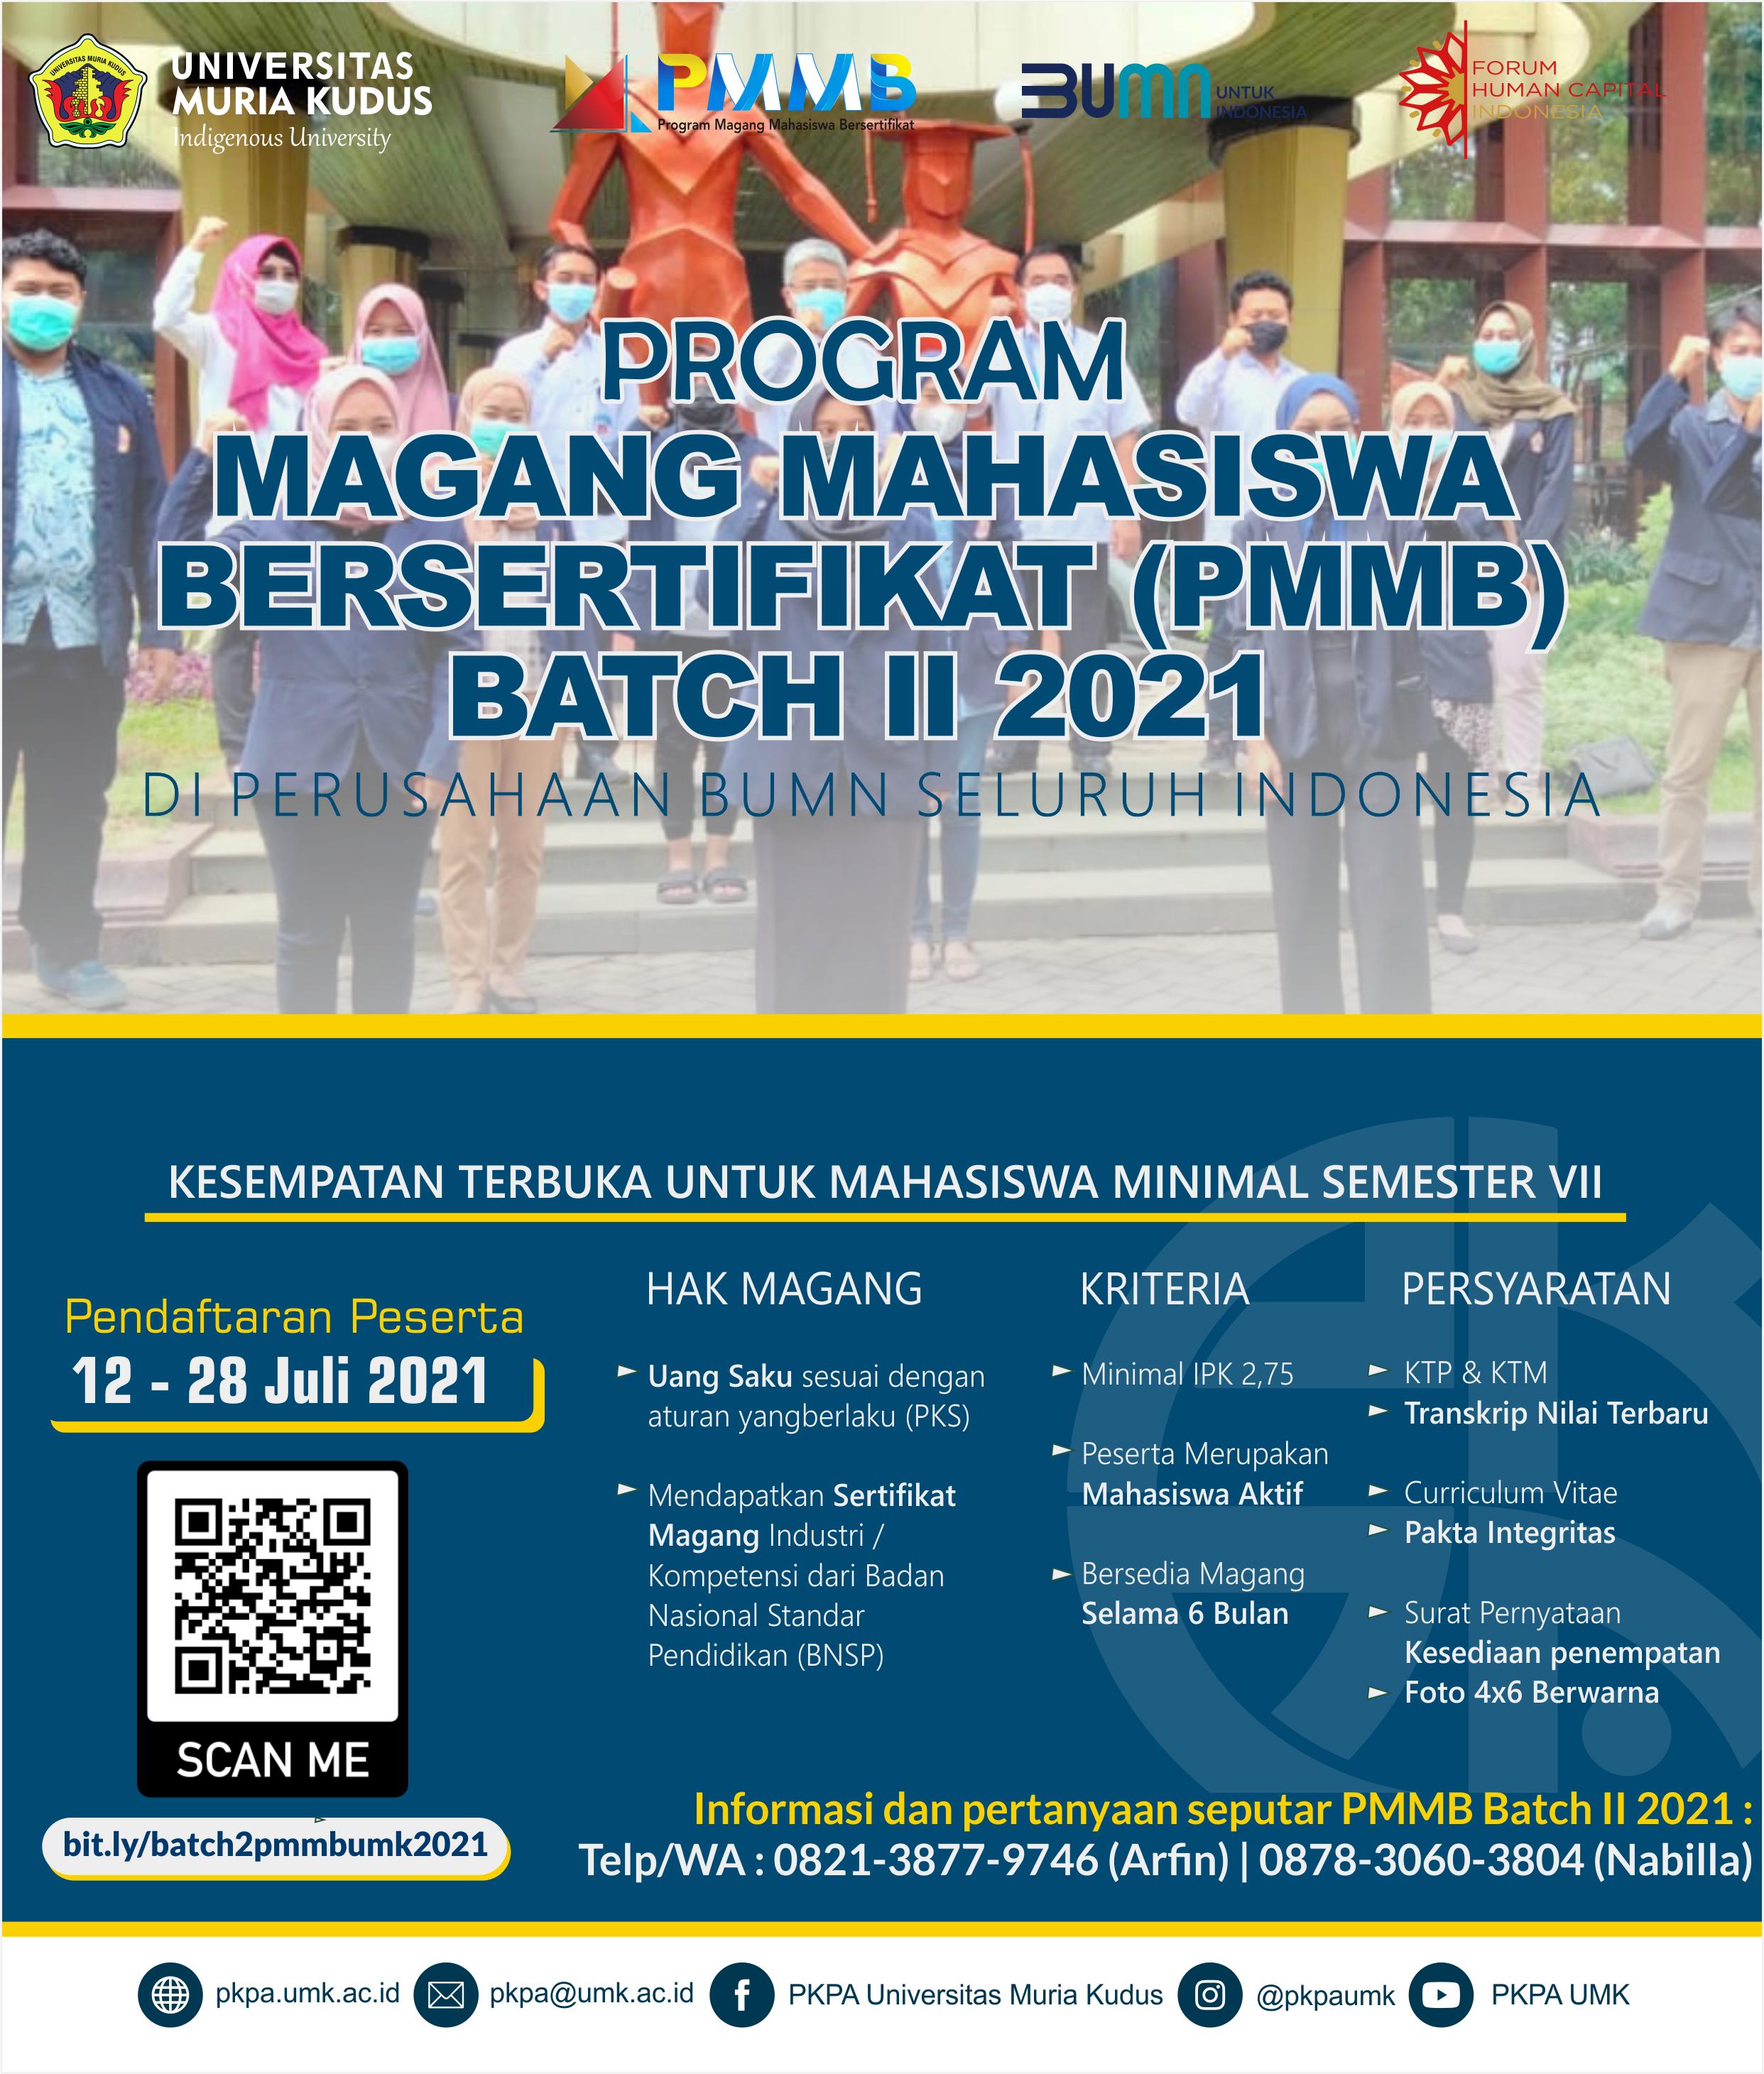 PMMB-Batch-II-2021-New